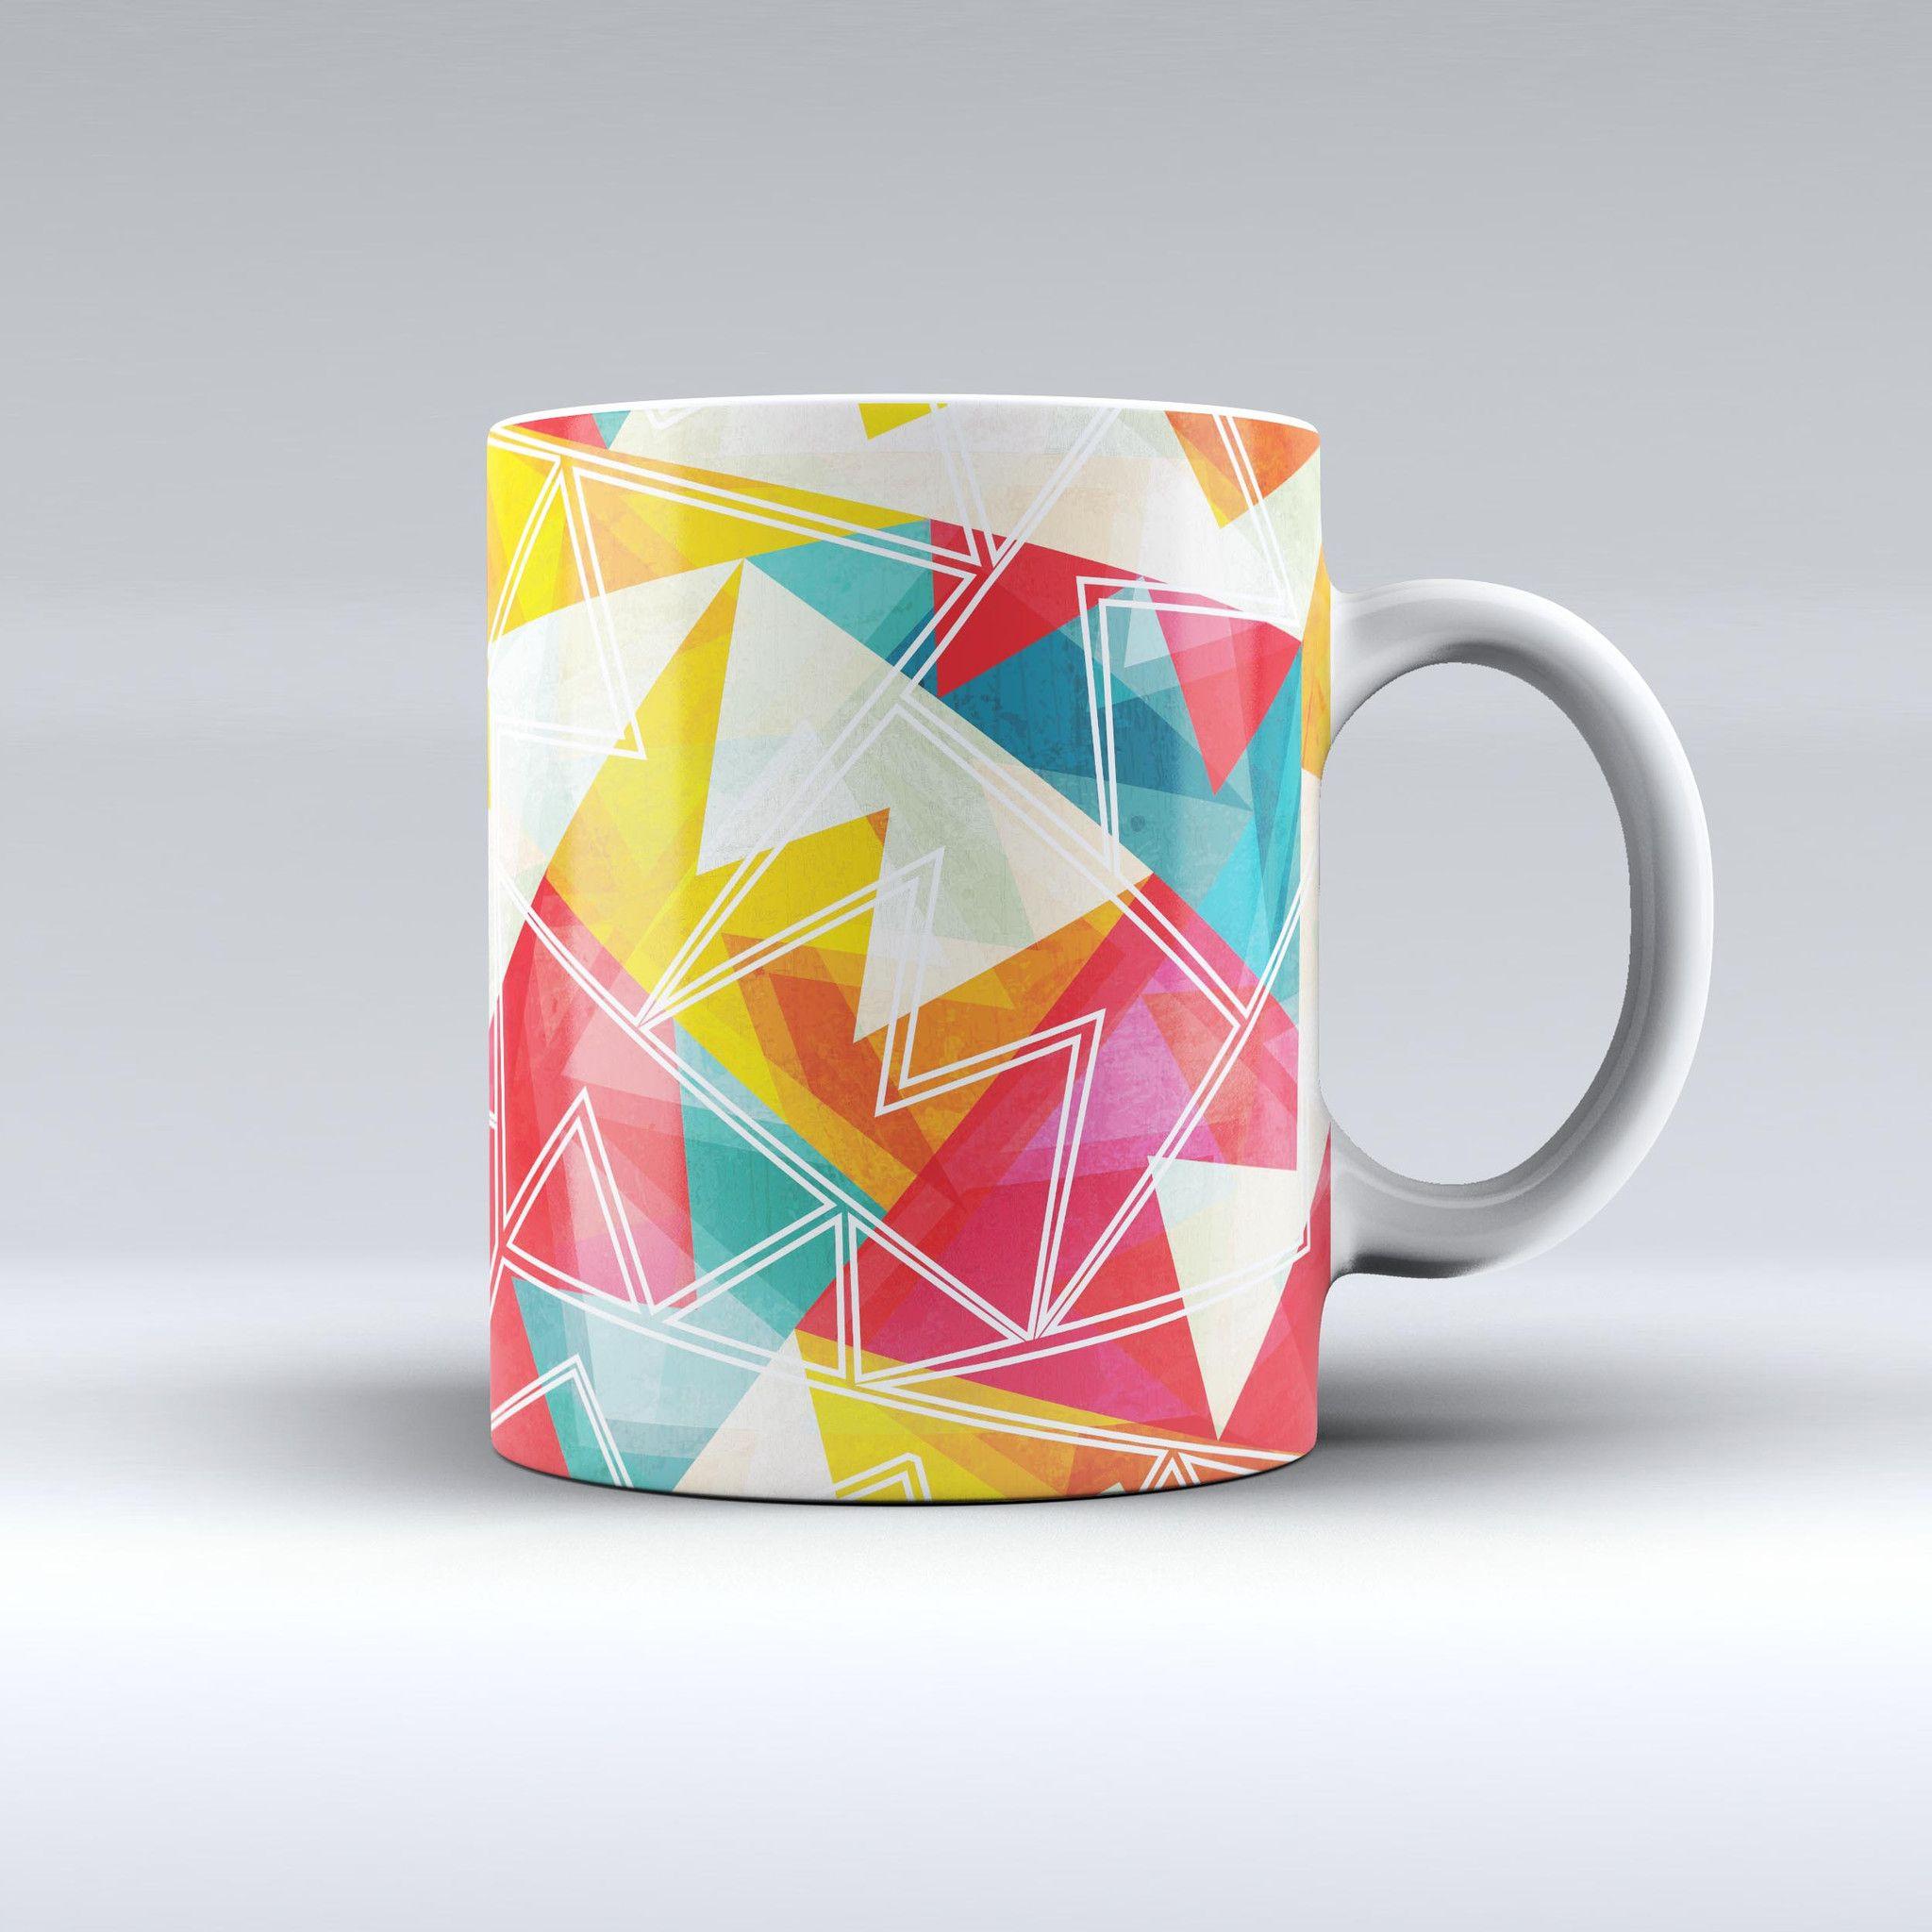 The Vintage Retro Overlap ink-Fuzed Ceramic Coffee Mug from DesignSkinz